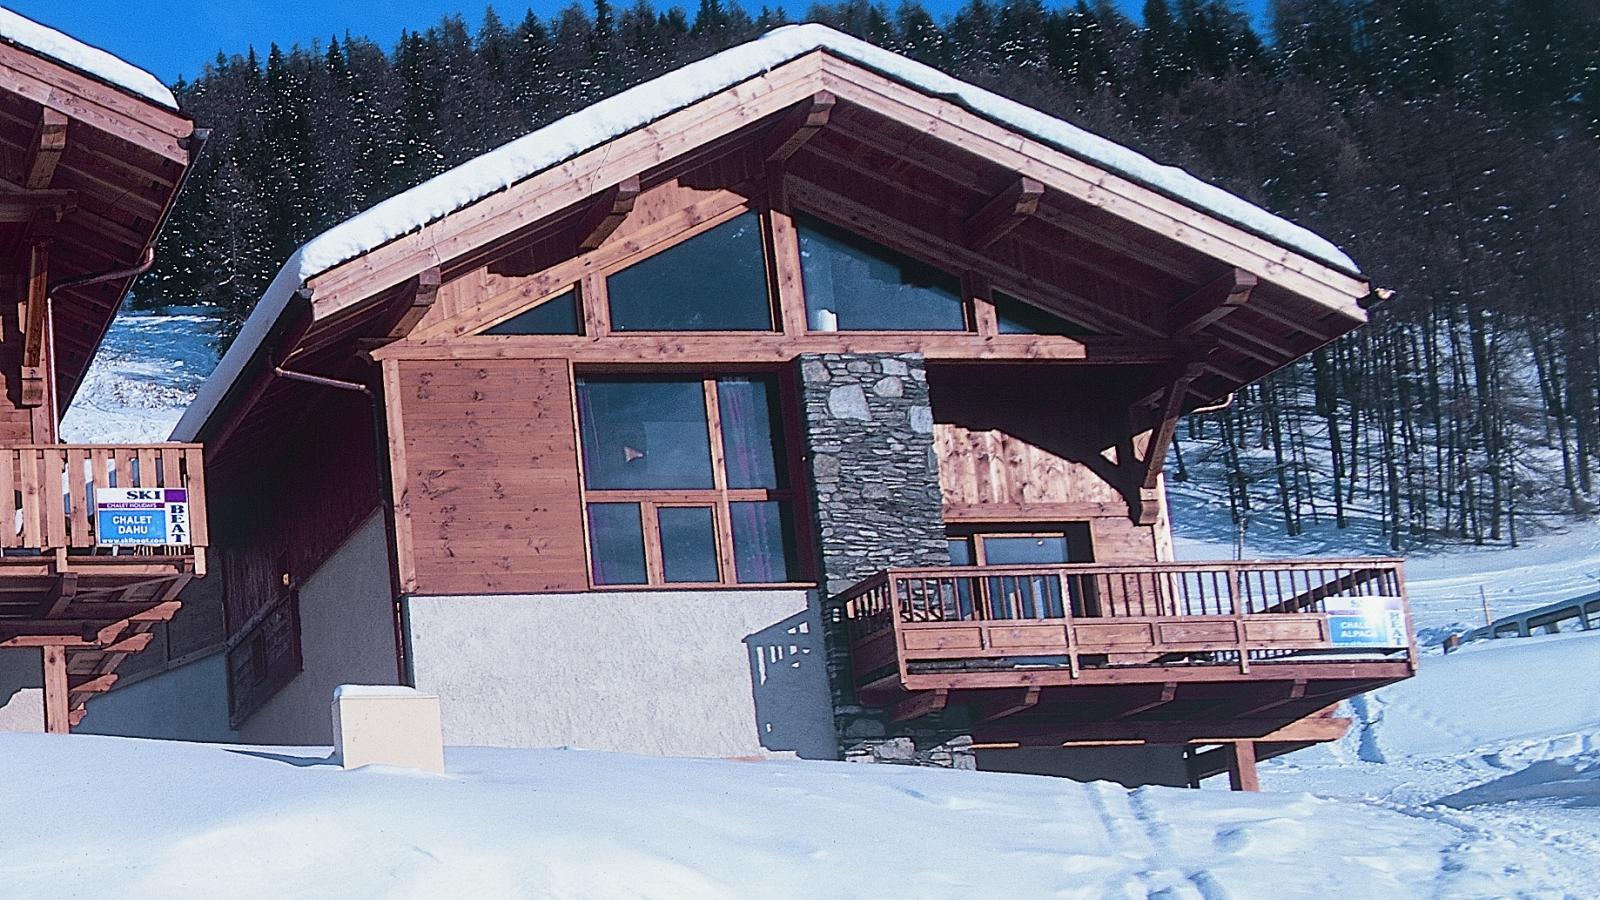 Ski France Plan Peisey Les Arcs Chalet Alpaca Ski